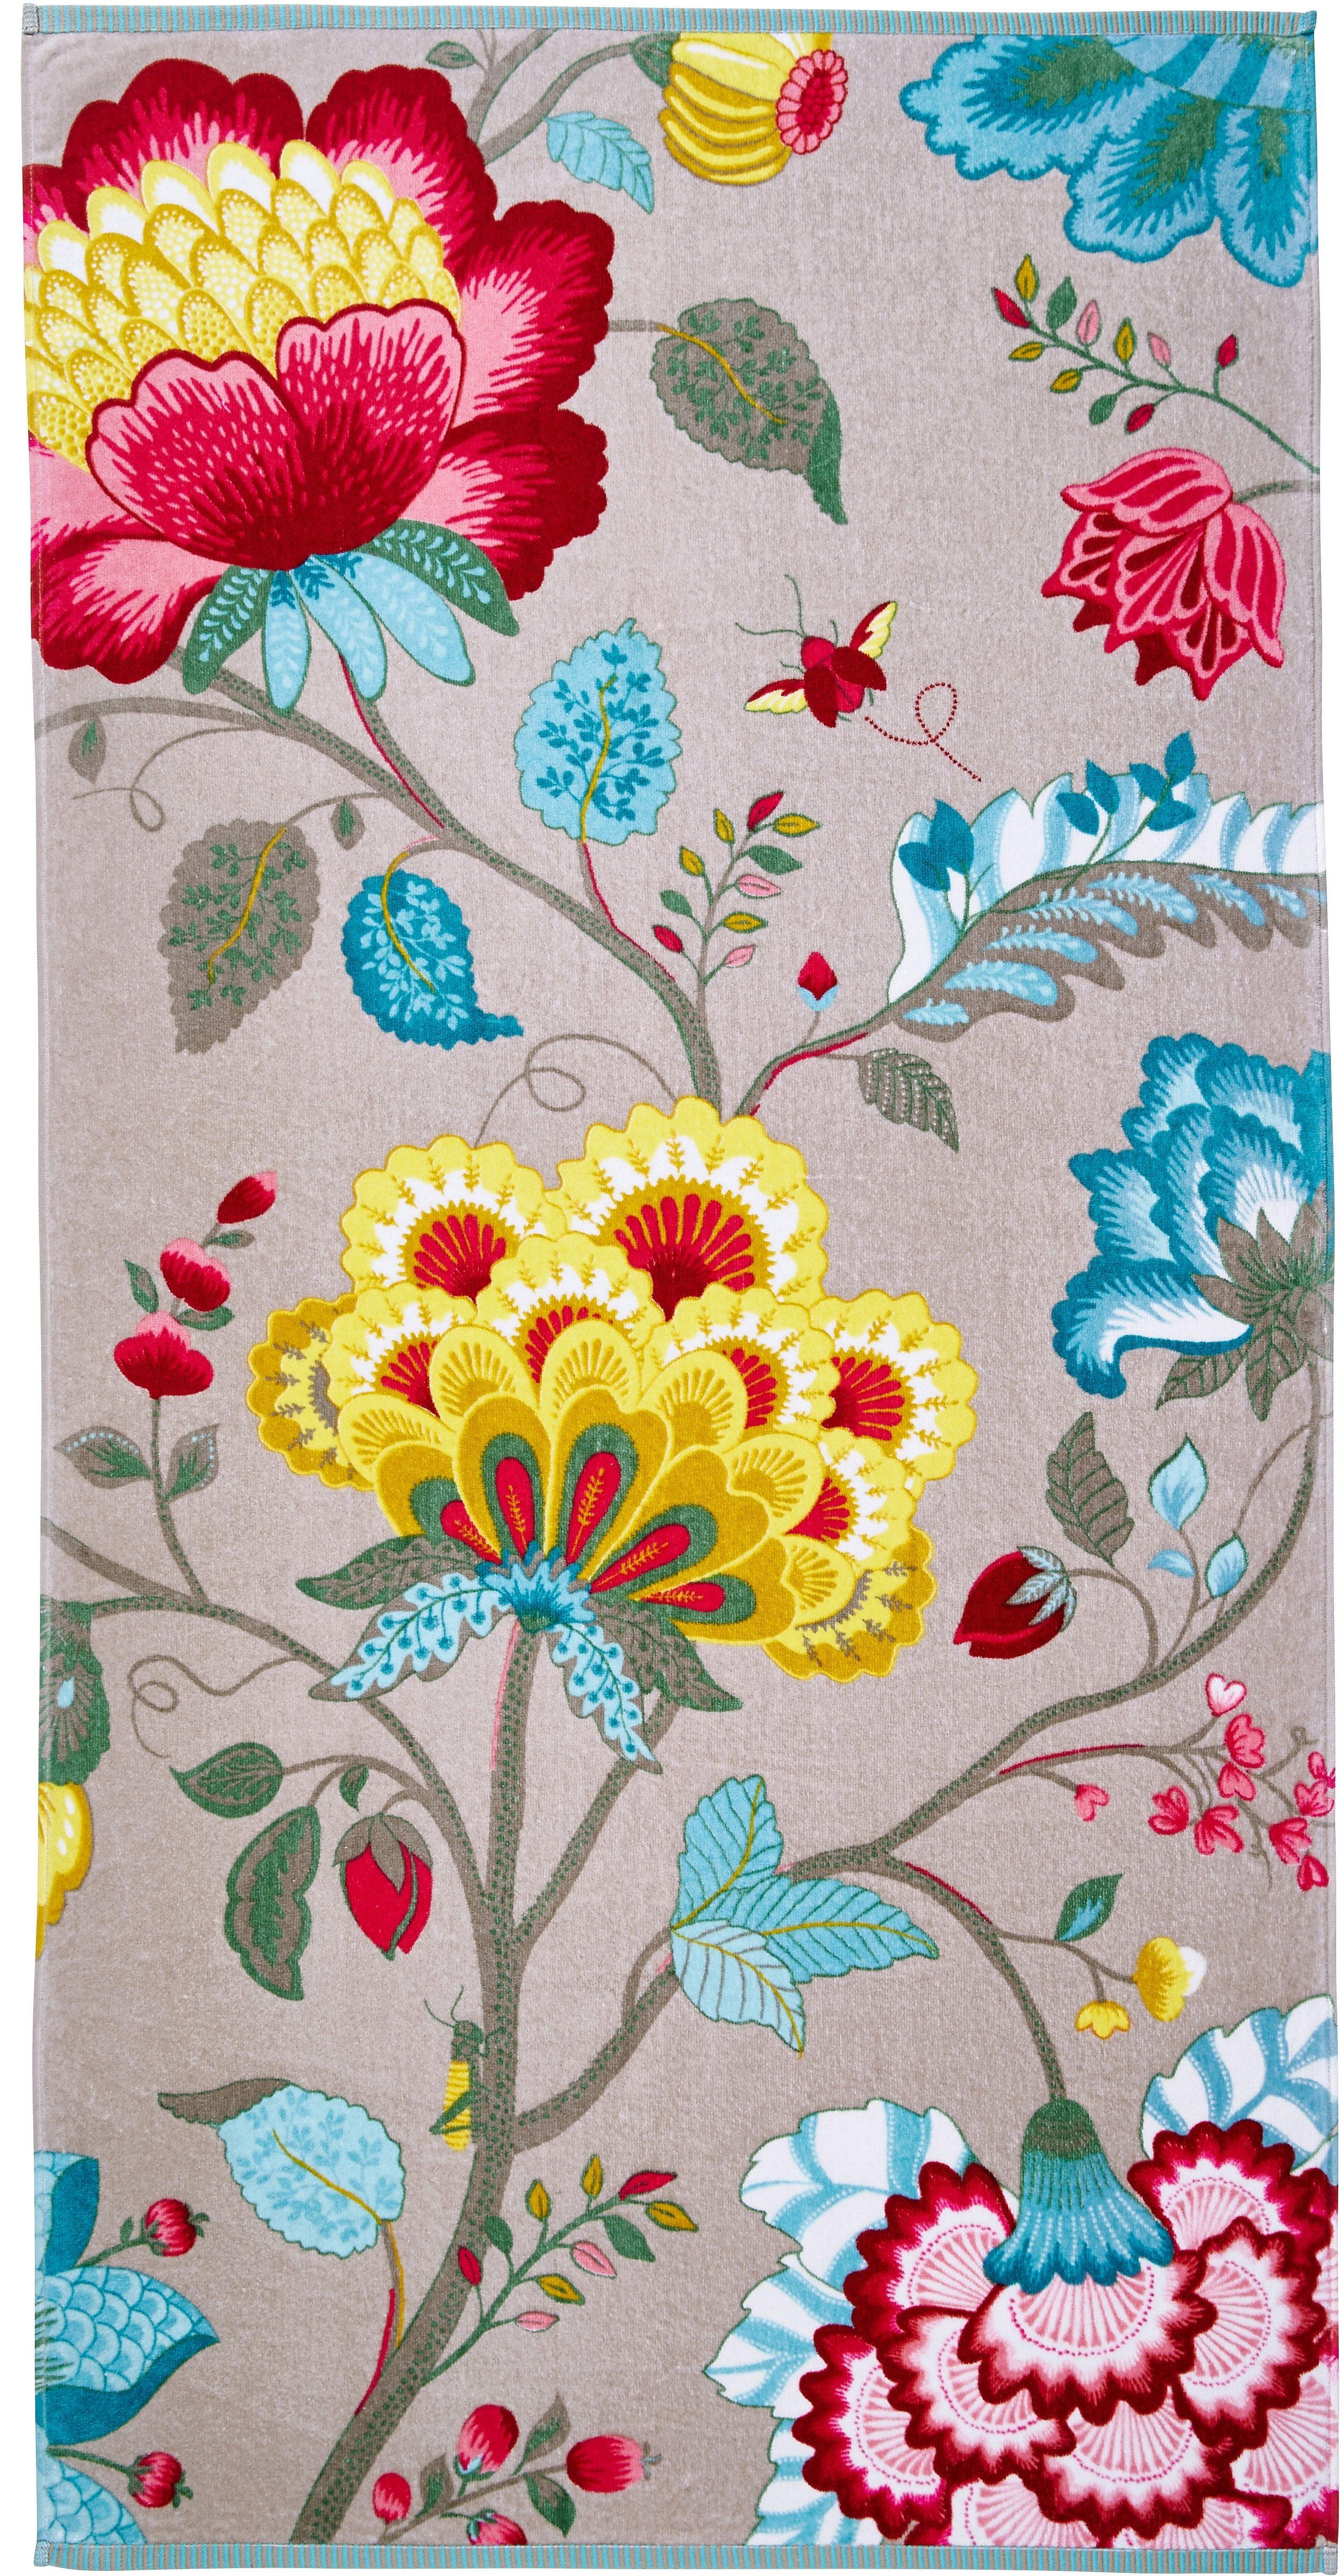 Badetuch, PiP Studio, »Floral Fantasy«, mit großen Blüten | Bad > Handtücher > Badetücher | PiP Studio